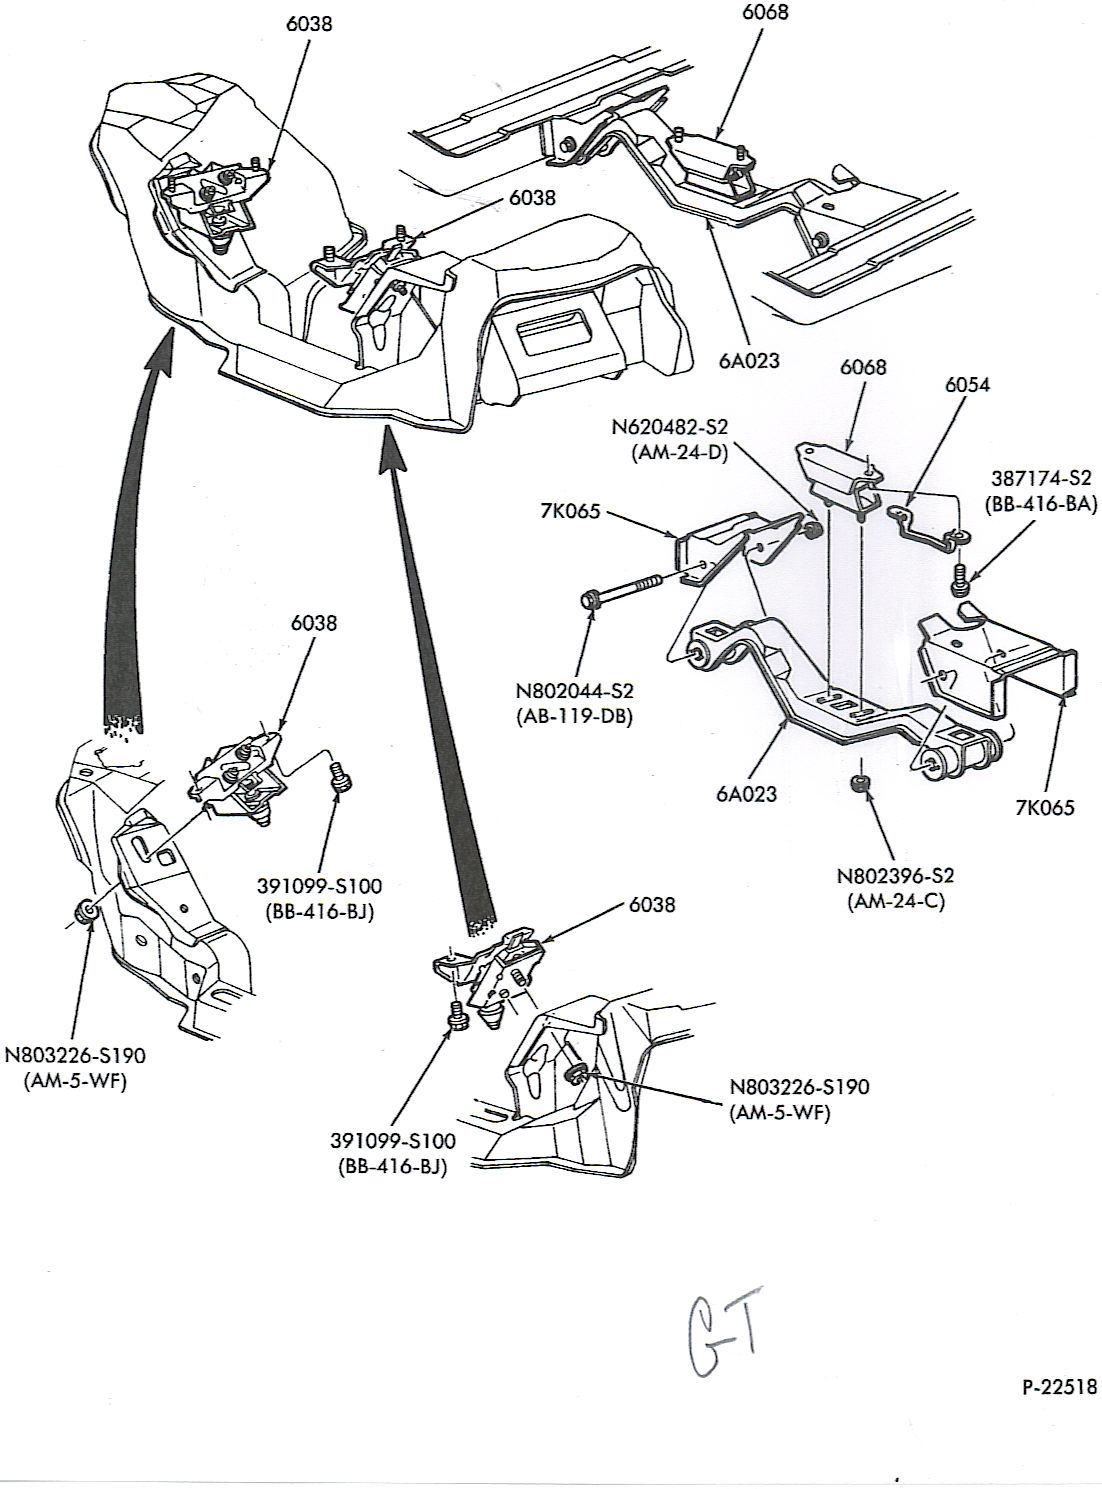 Motor mounts convertible motor mounts pare to solid mounts 91gtmotormounts